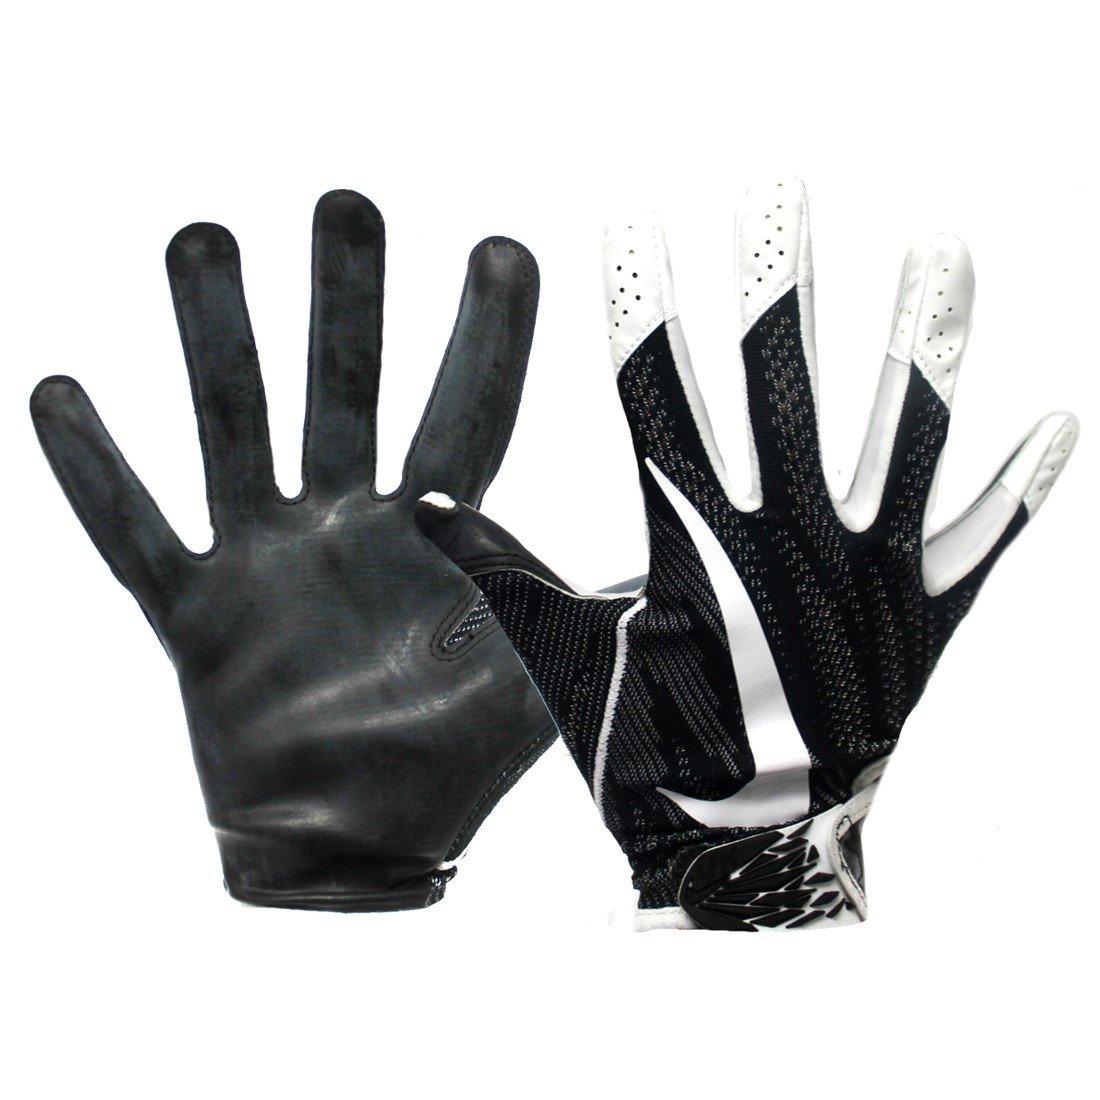 d5d20fb30299a Nike Promo Vapor Knit 2 Adult Football Receiver Gloves 2XL ...